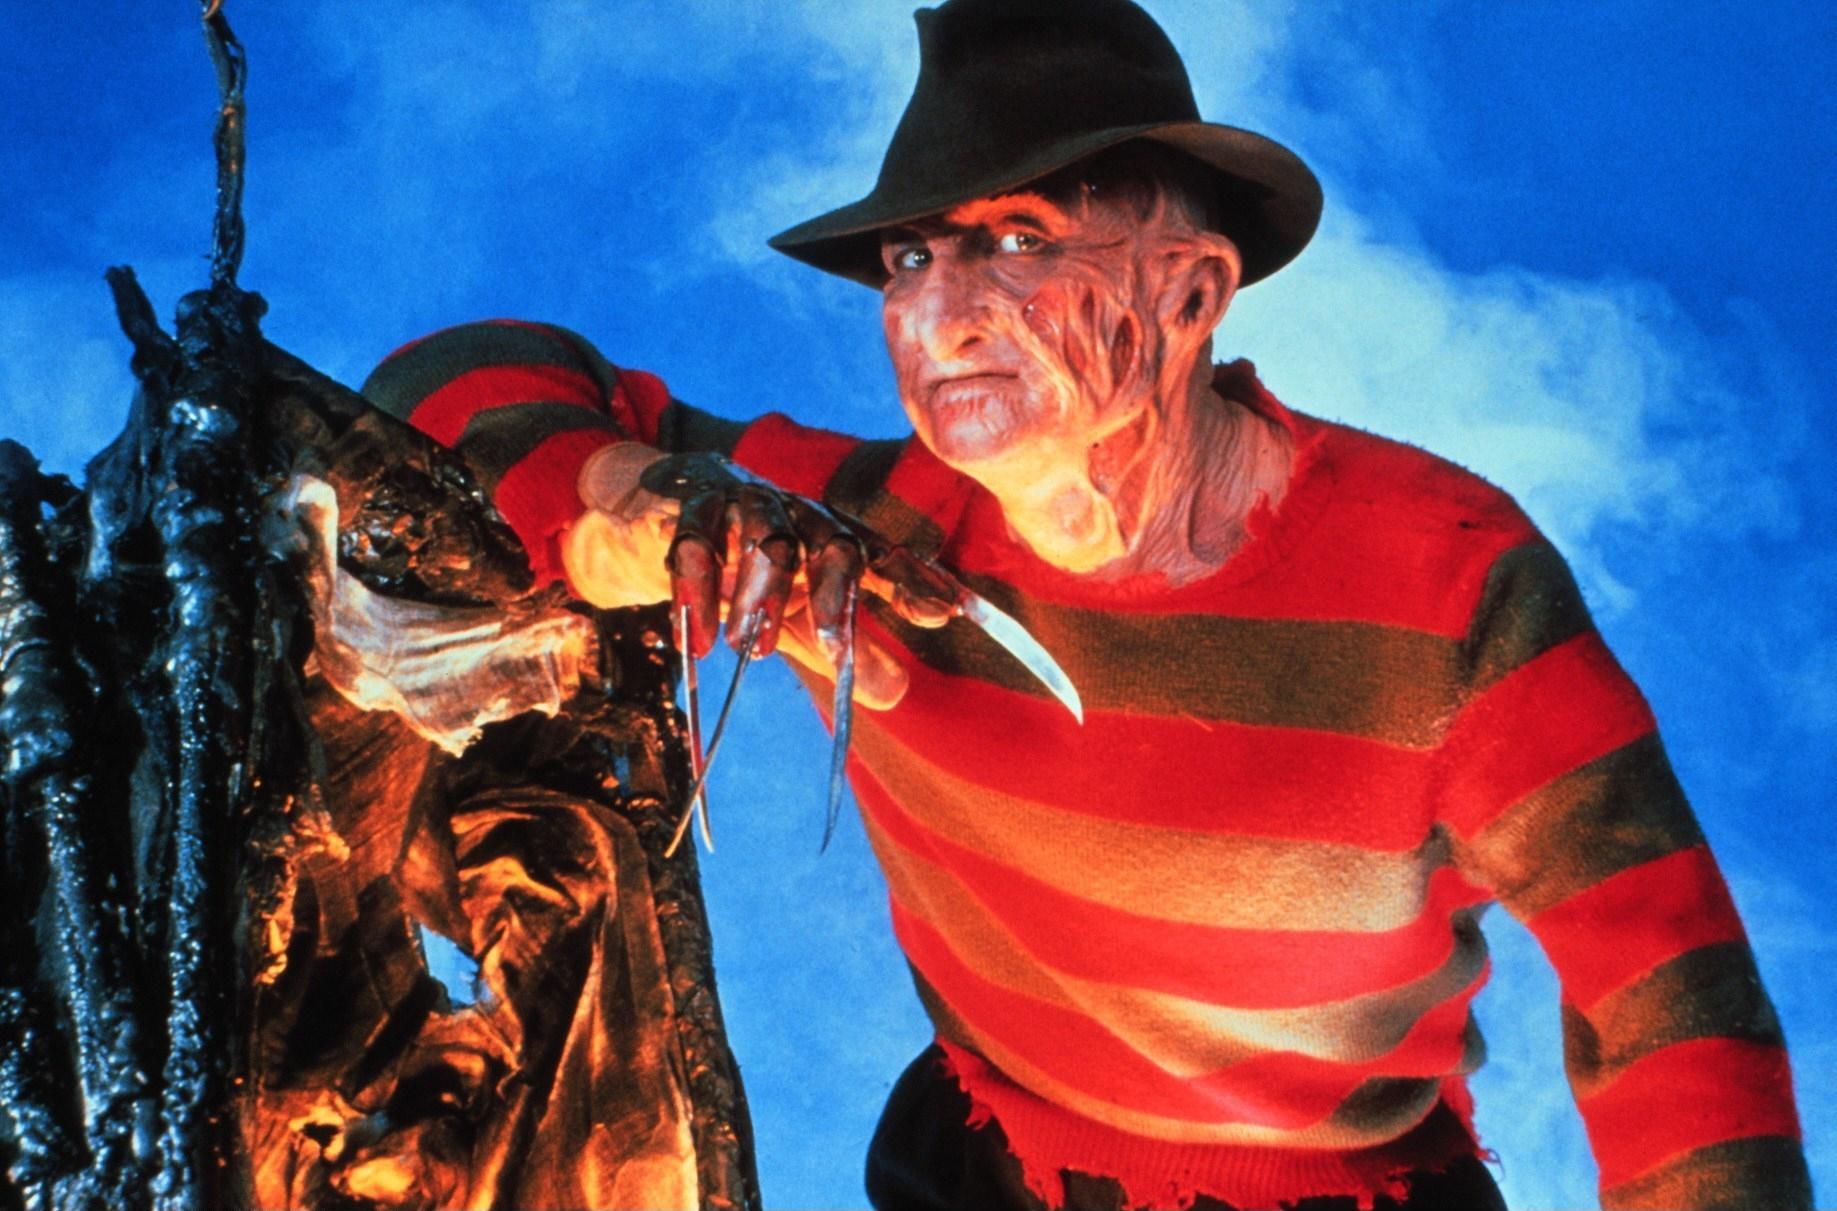 Nightmare 5 - Das Trauma (A Nightmare on Elm Street: The Dream Child, USA 1989, Regie: Stephen Hopkins) Robert Englund (als F